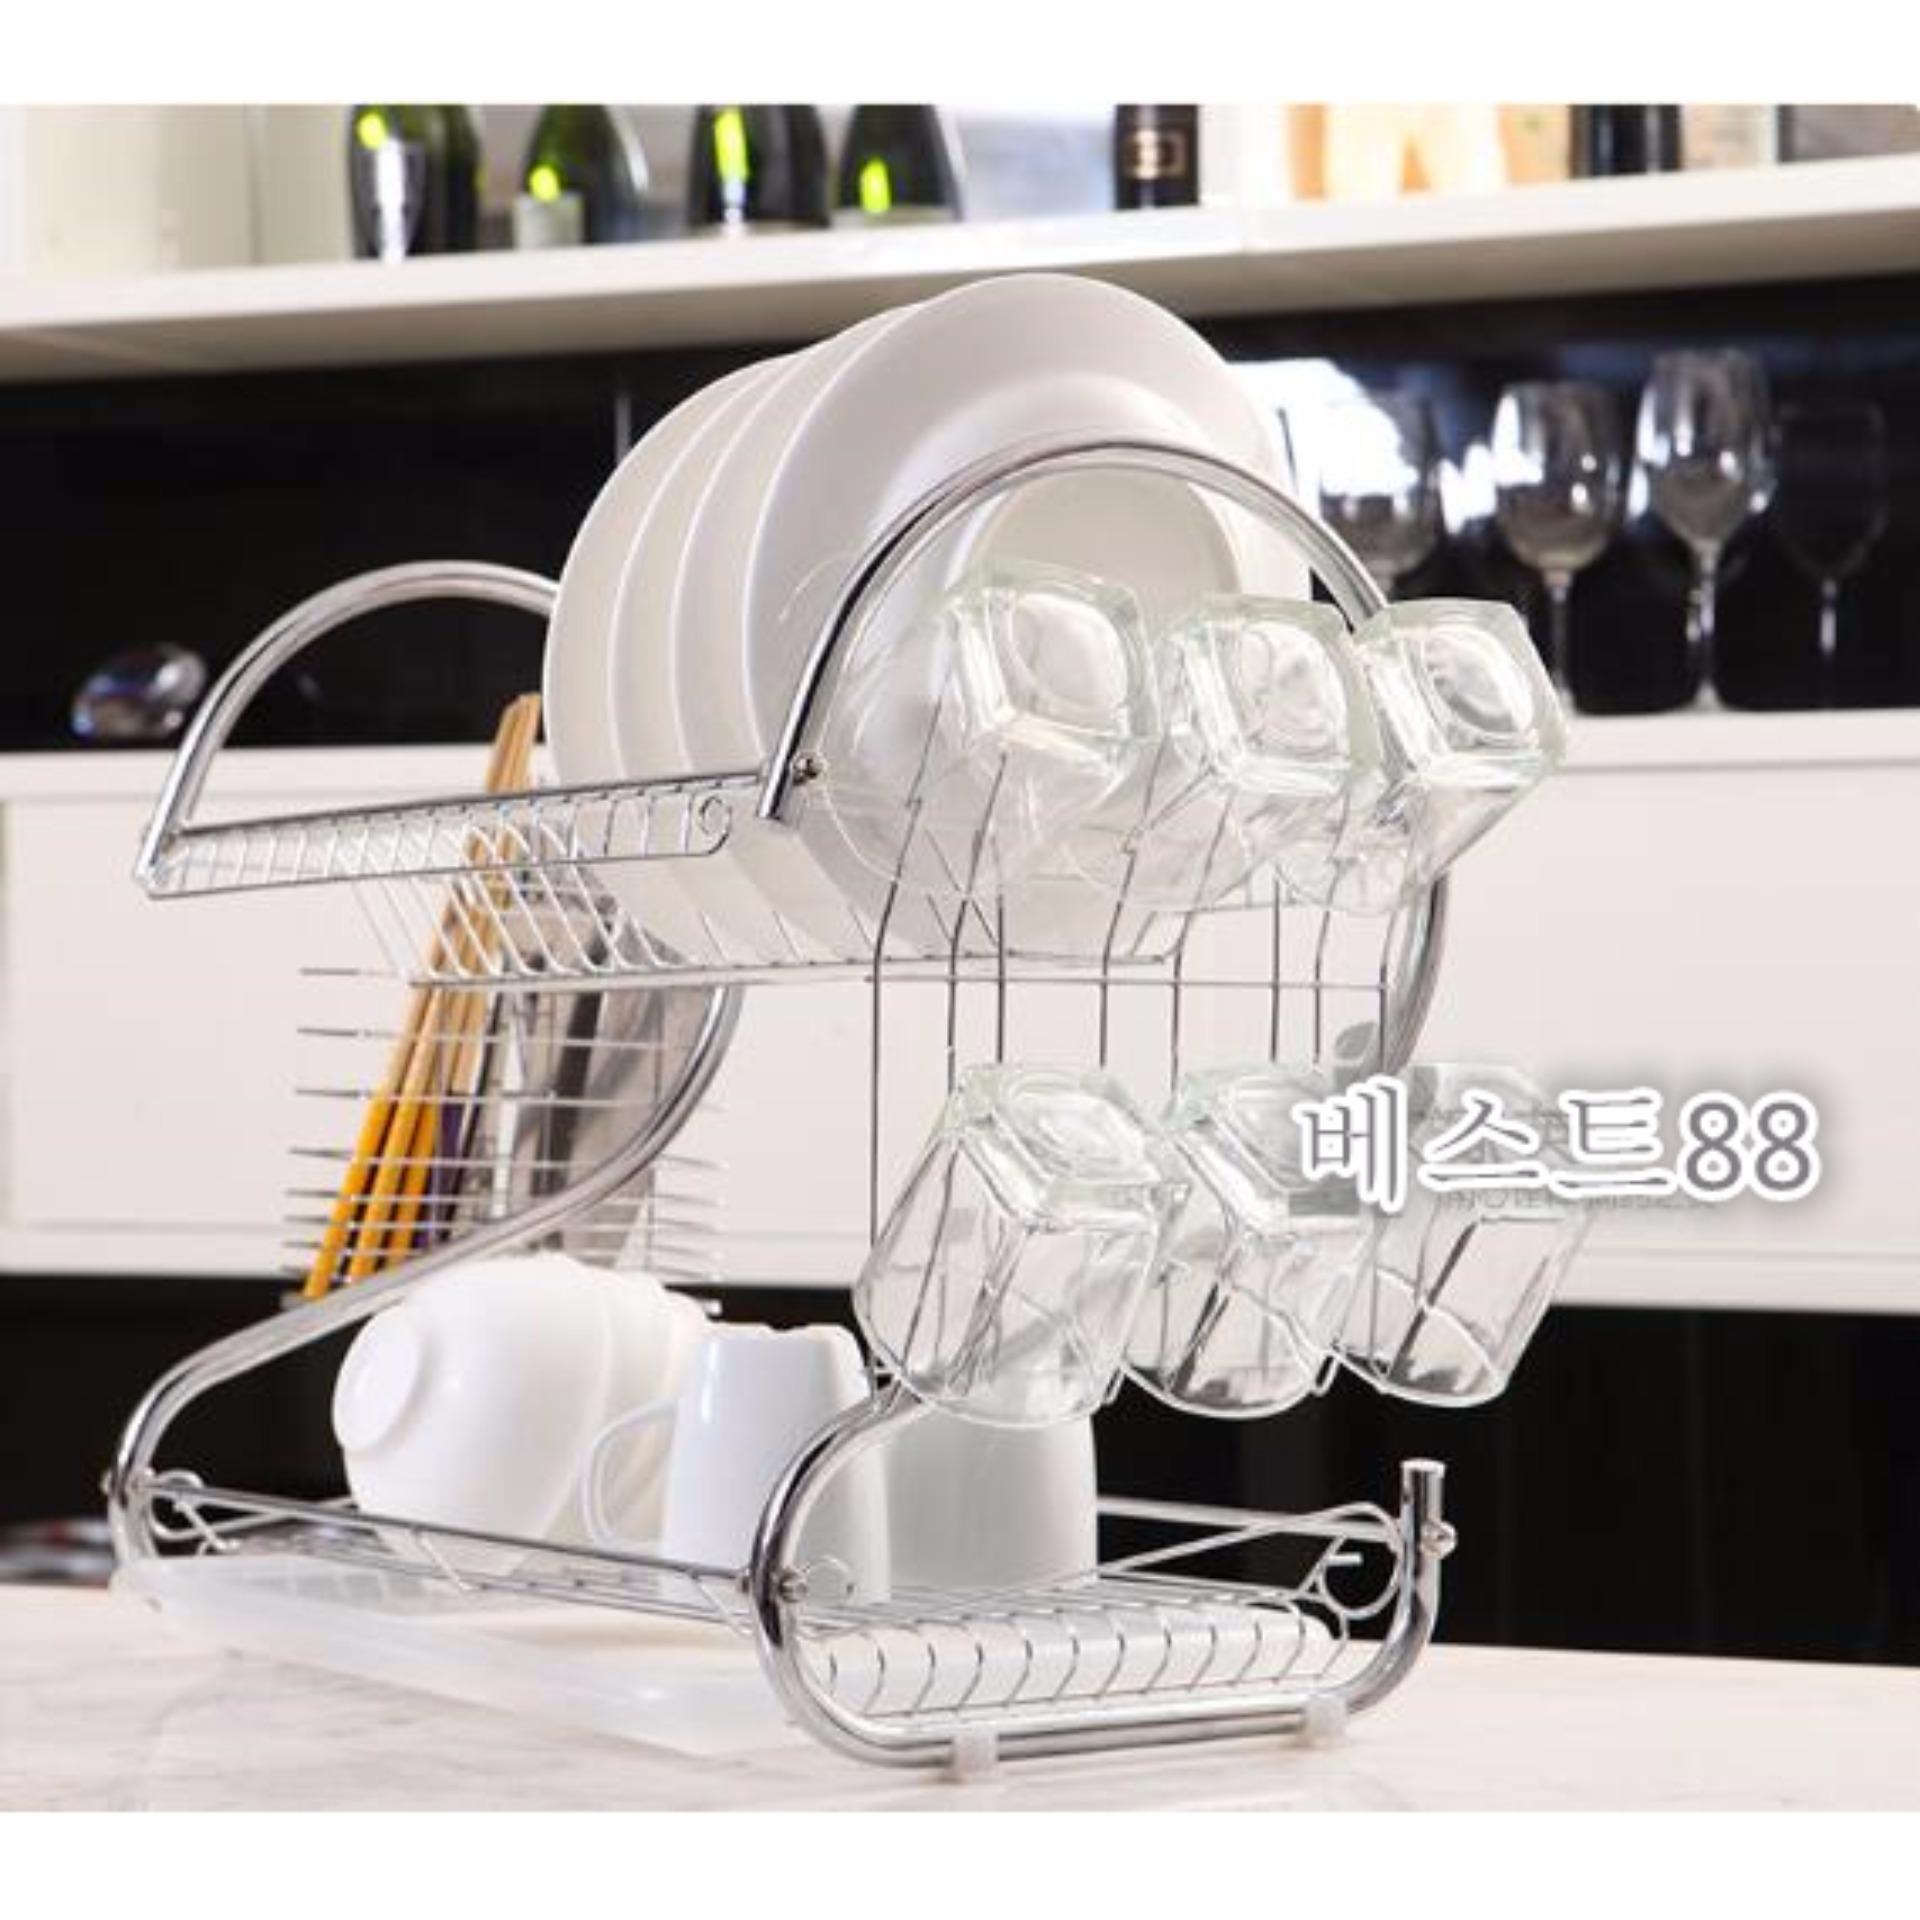 Diskon 2 Layers Dish Drainer Rak Tempat Piring 2 Susun Stainless Gelas Mangkok Branded